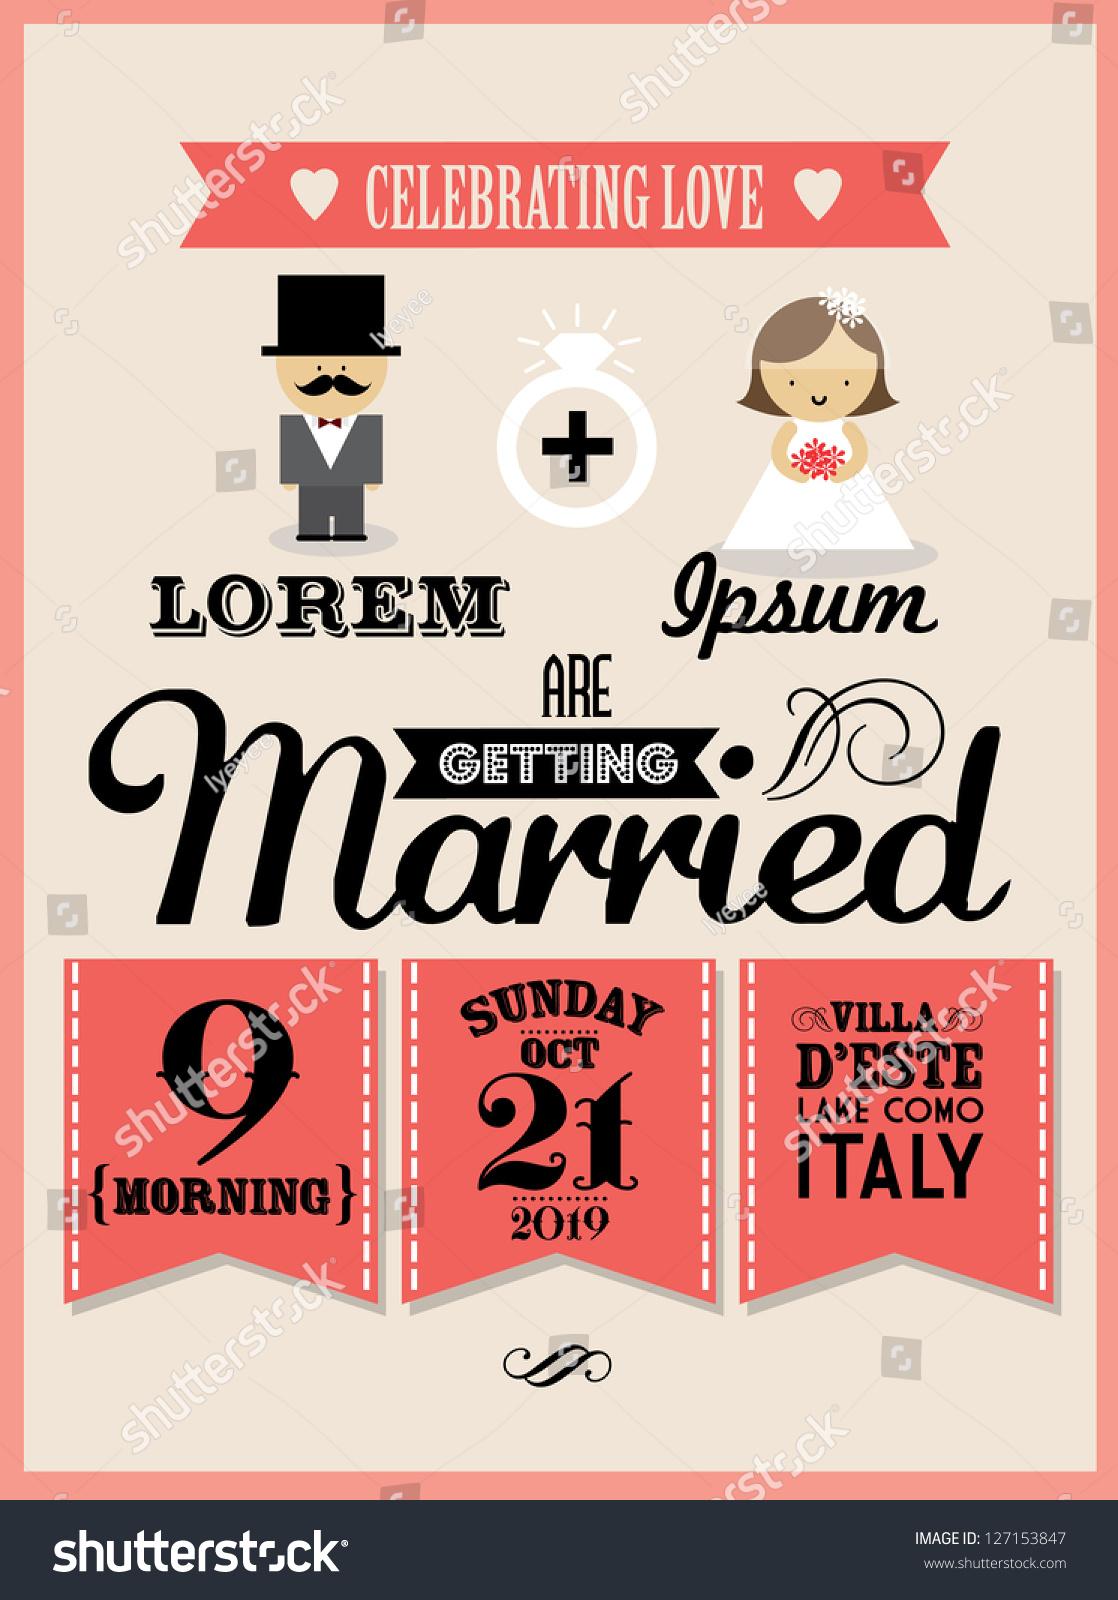 Wedding Invitation Card Template Vectorillustration Stock Vector ...